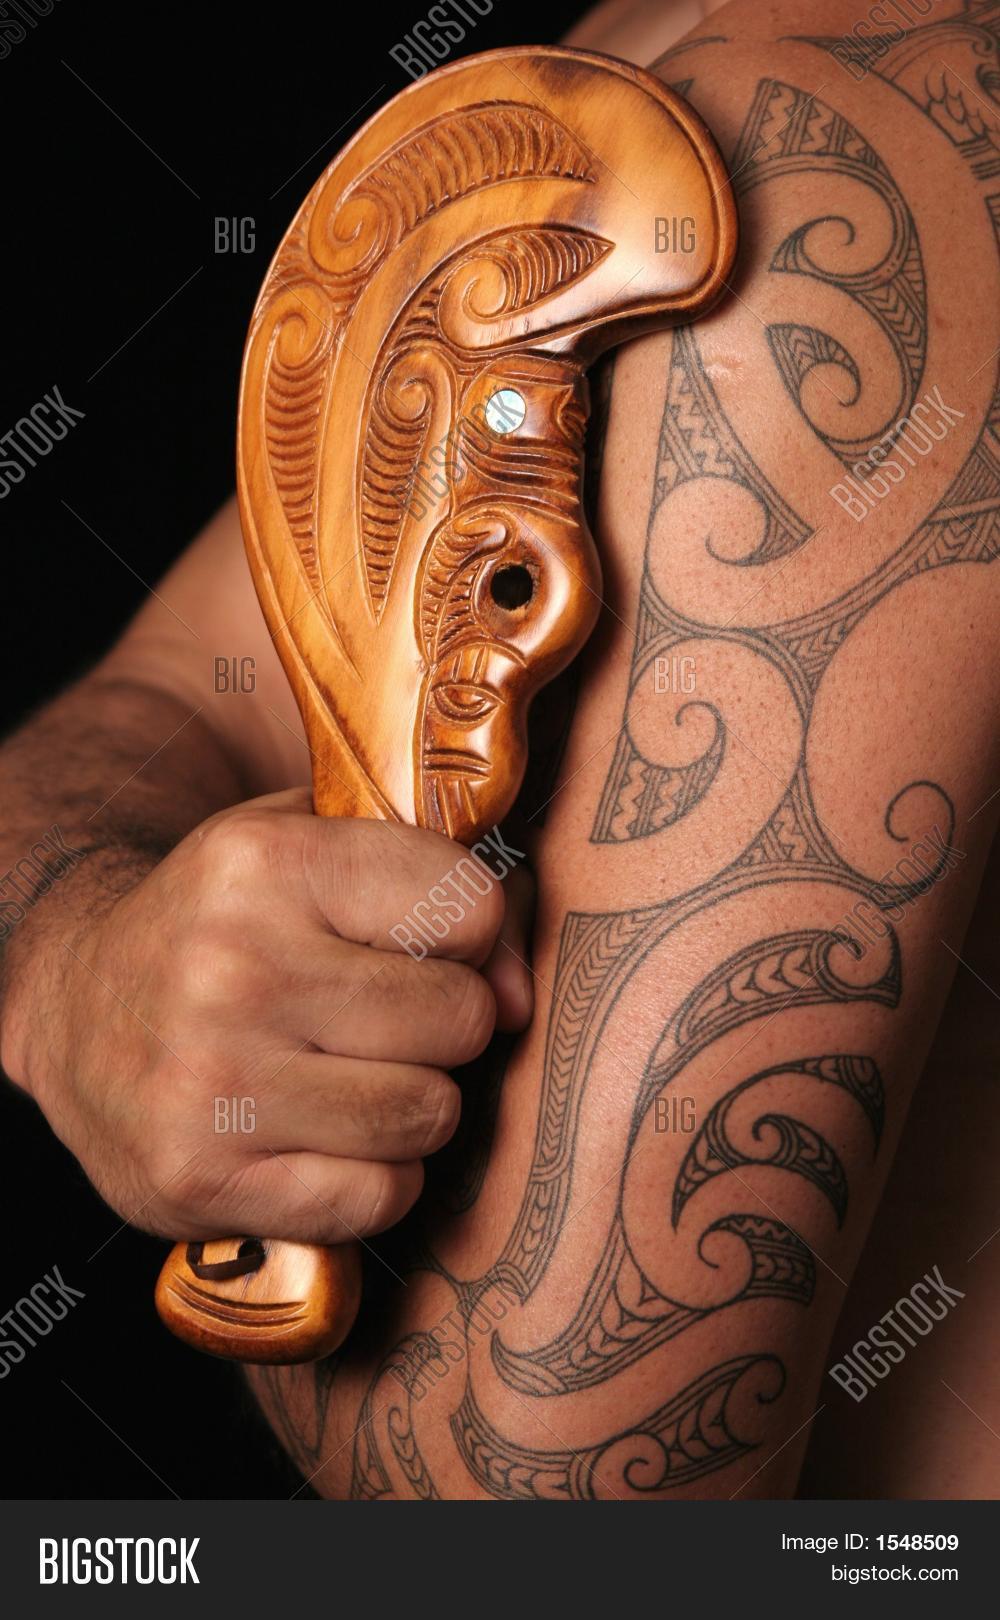 Imagen Y Foto Disenos De Tribus Prueba Gratis Bigstock - Tribus-maories